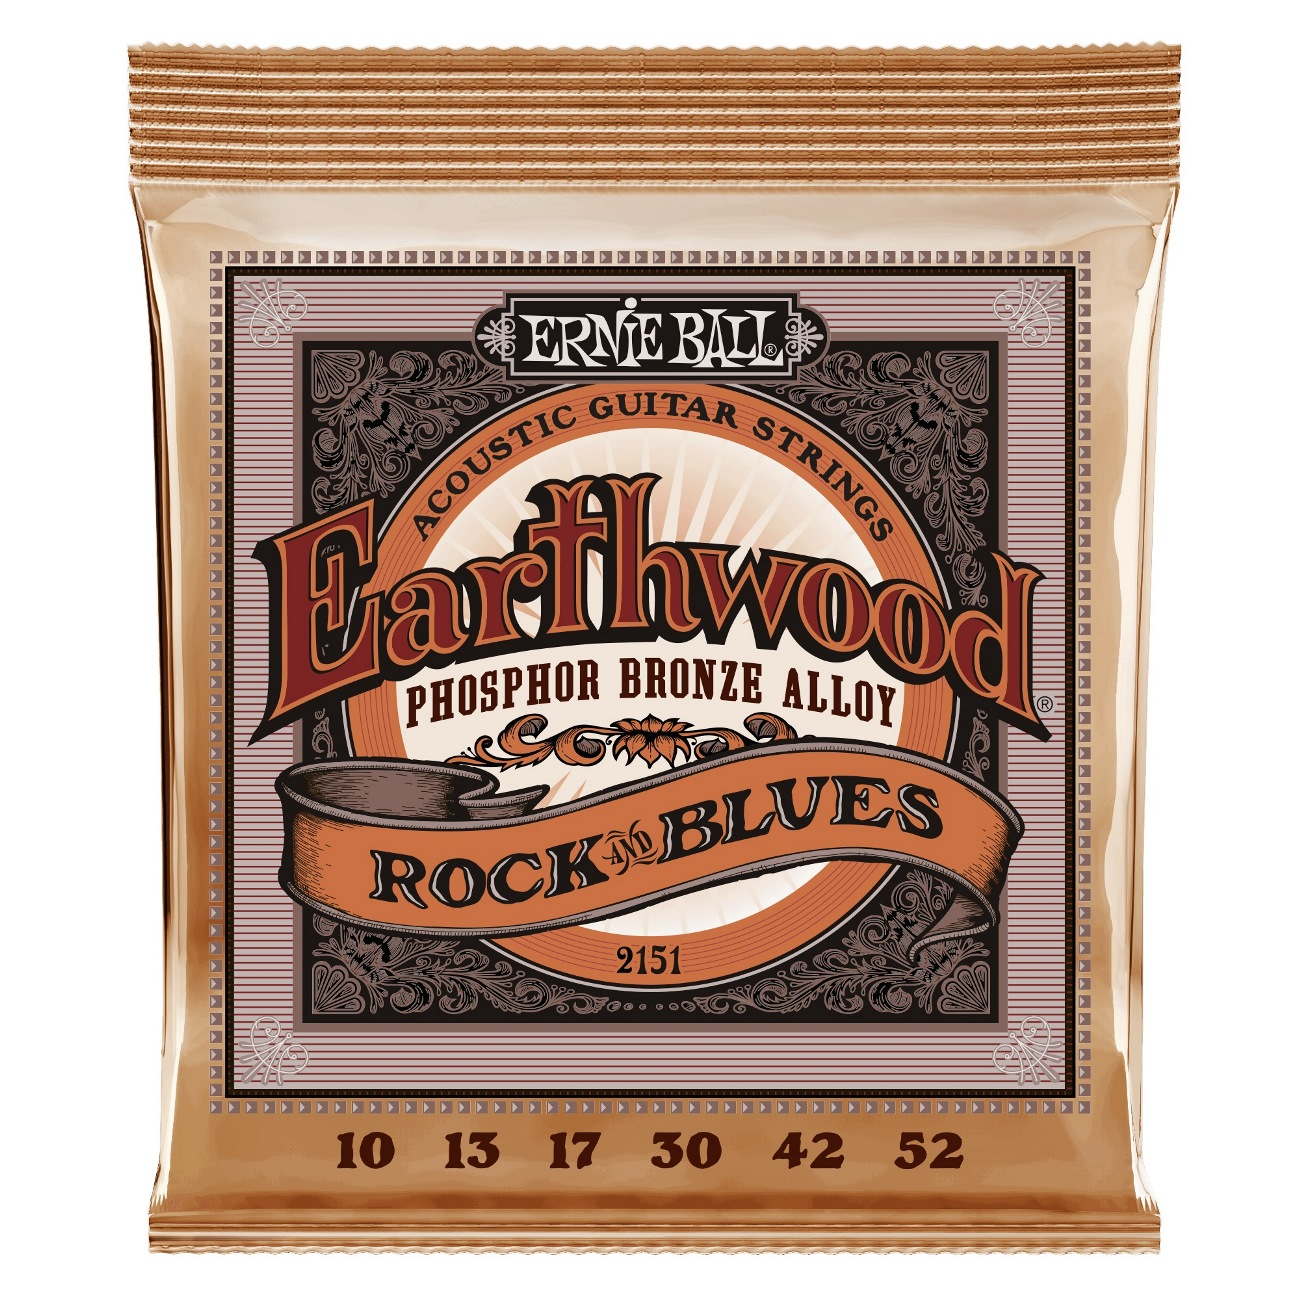 Ernie Ball Earthwood Rock /& Blues Phosphor Bronze Acoustic Guitar Strings P02151